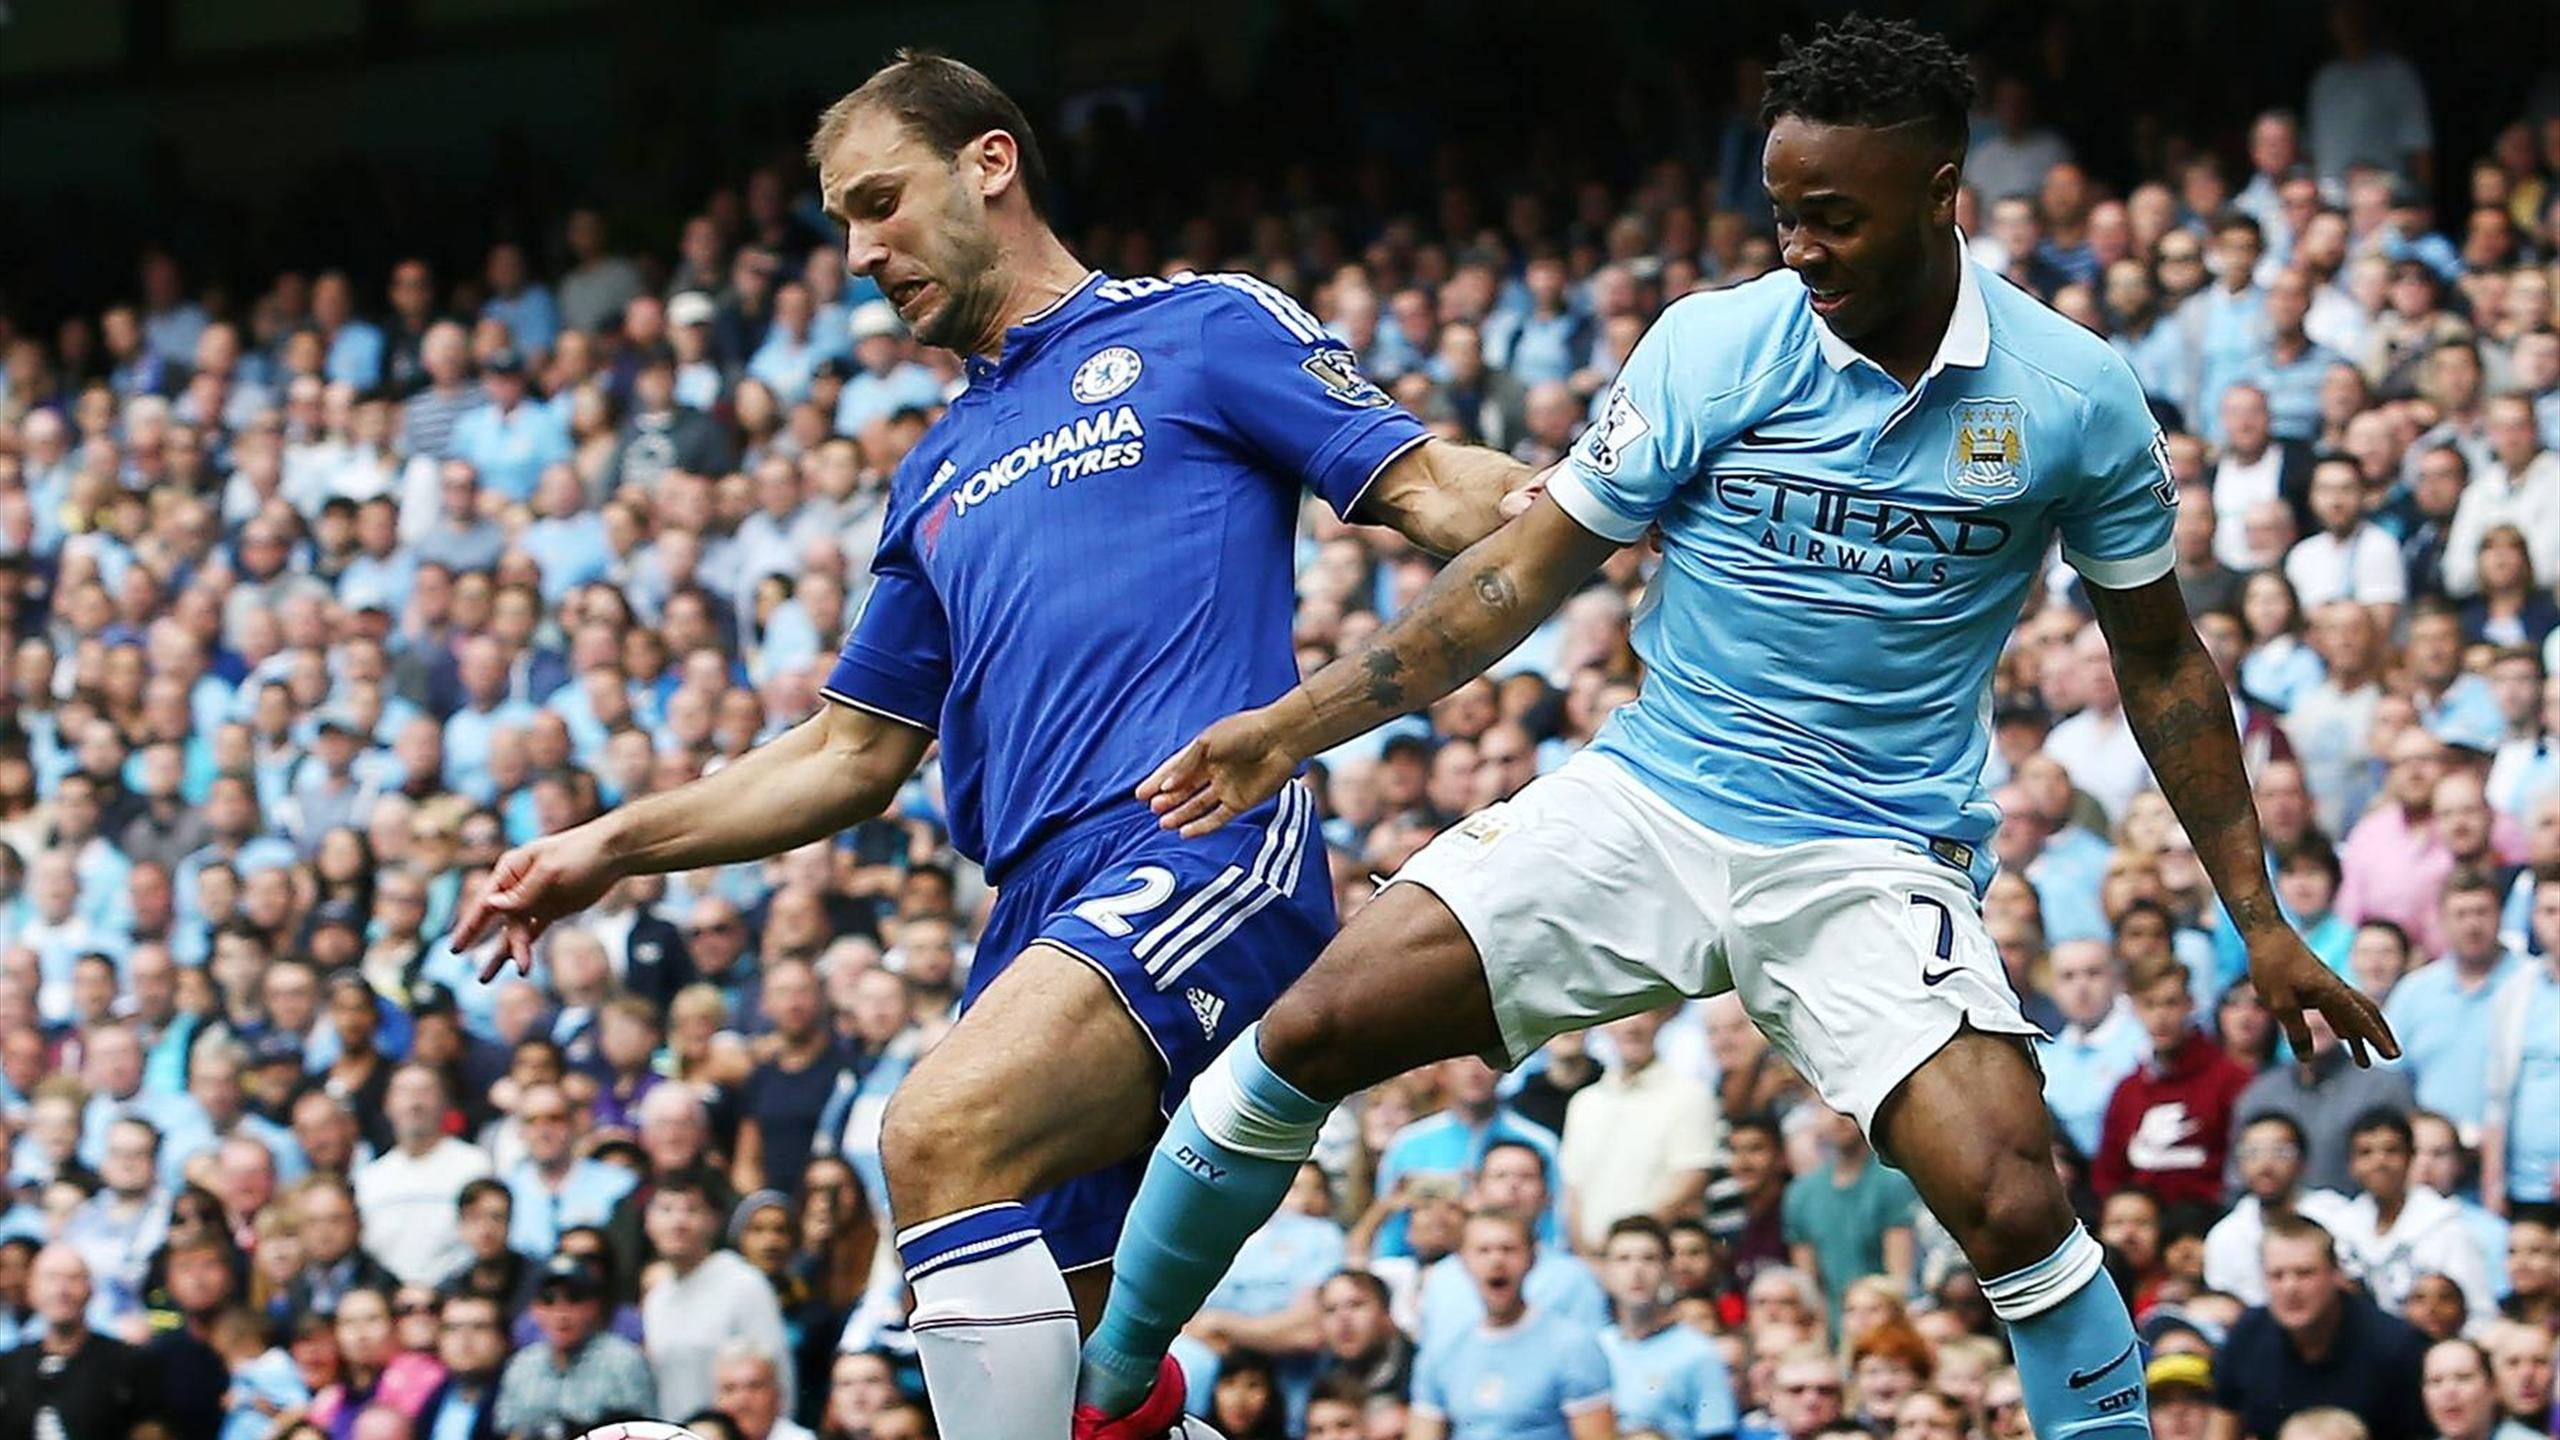 Branislav Ivanovic holds off Raheem Sterling of Manchester City